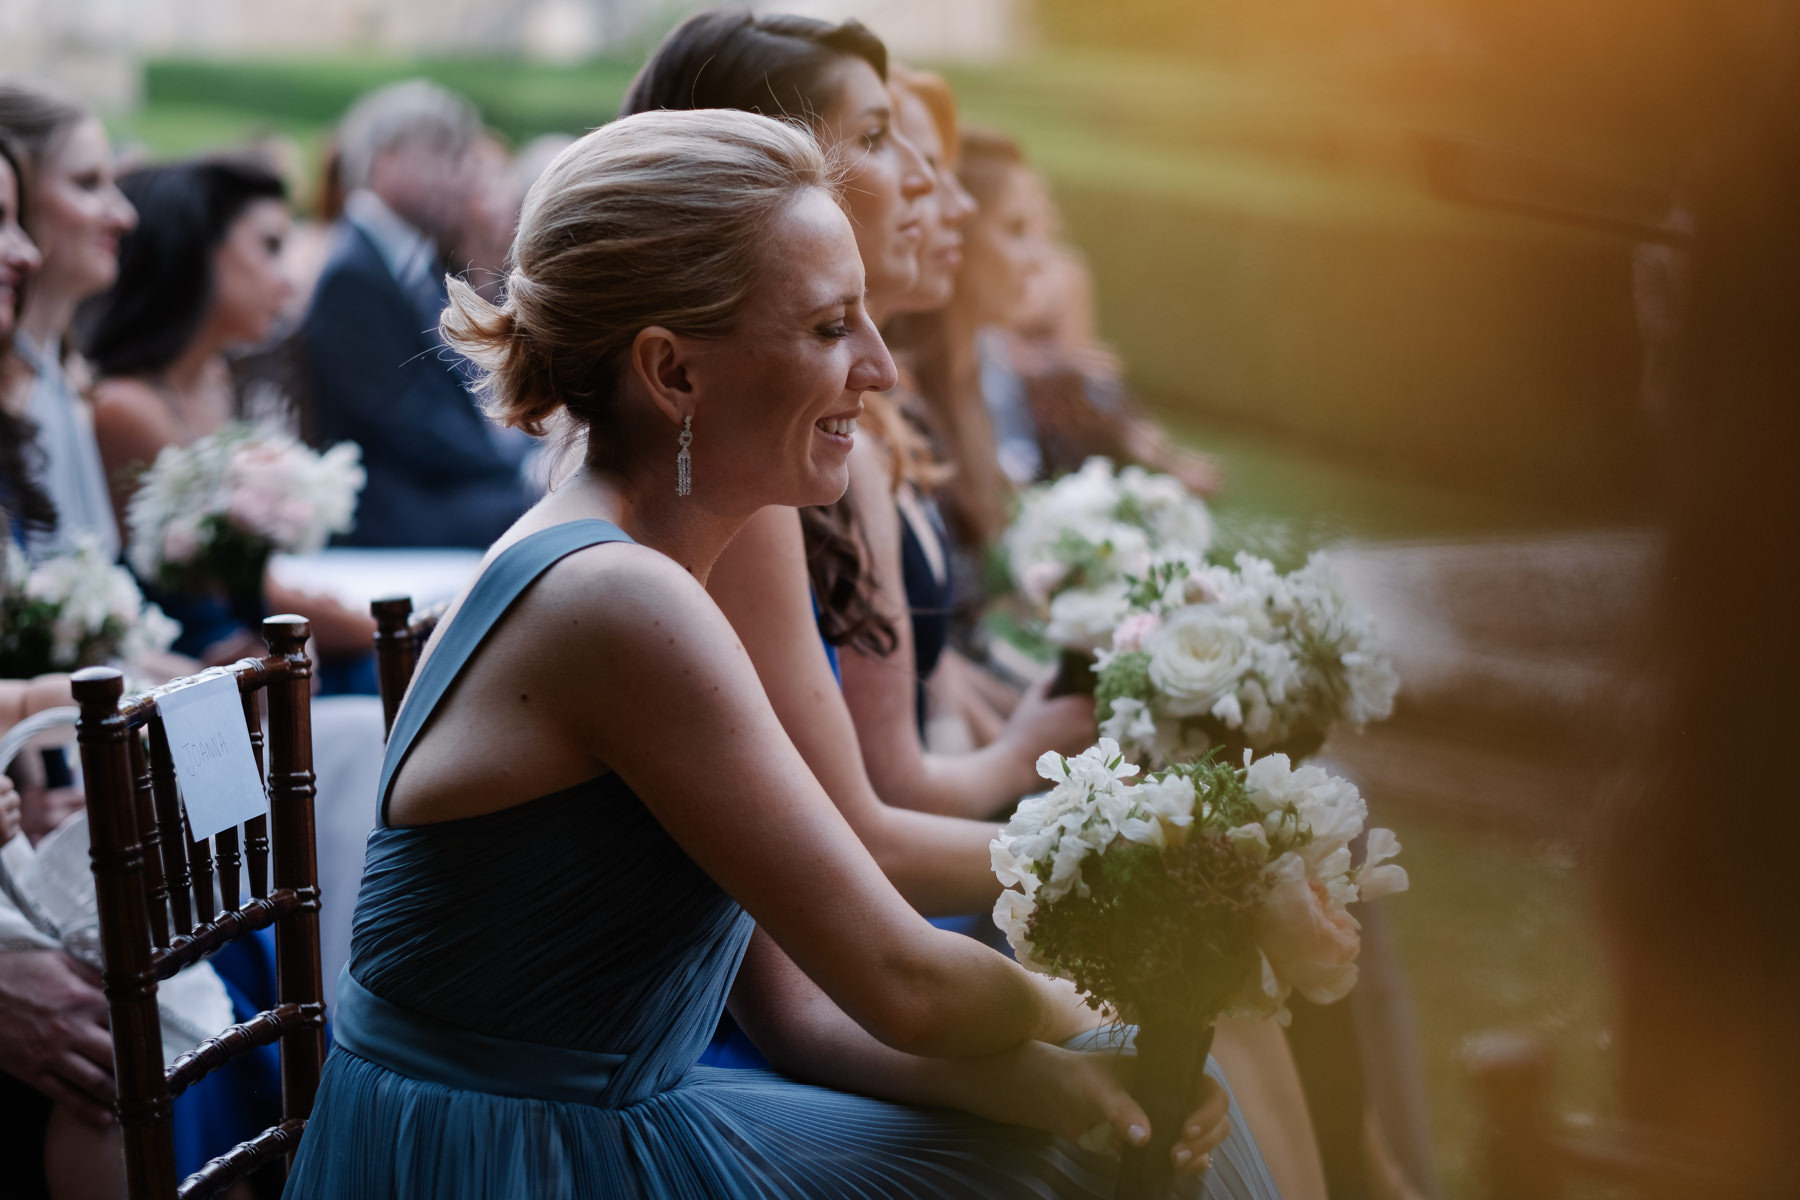 guests at the wedding at la foce